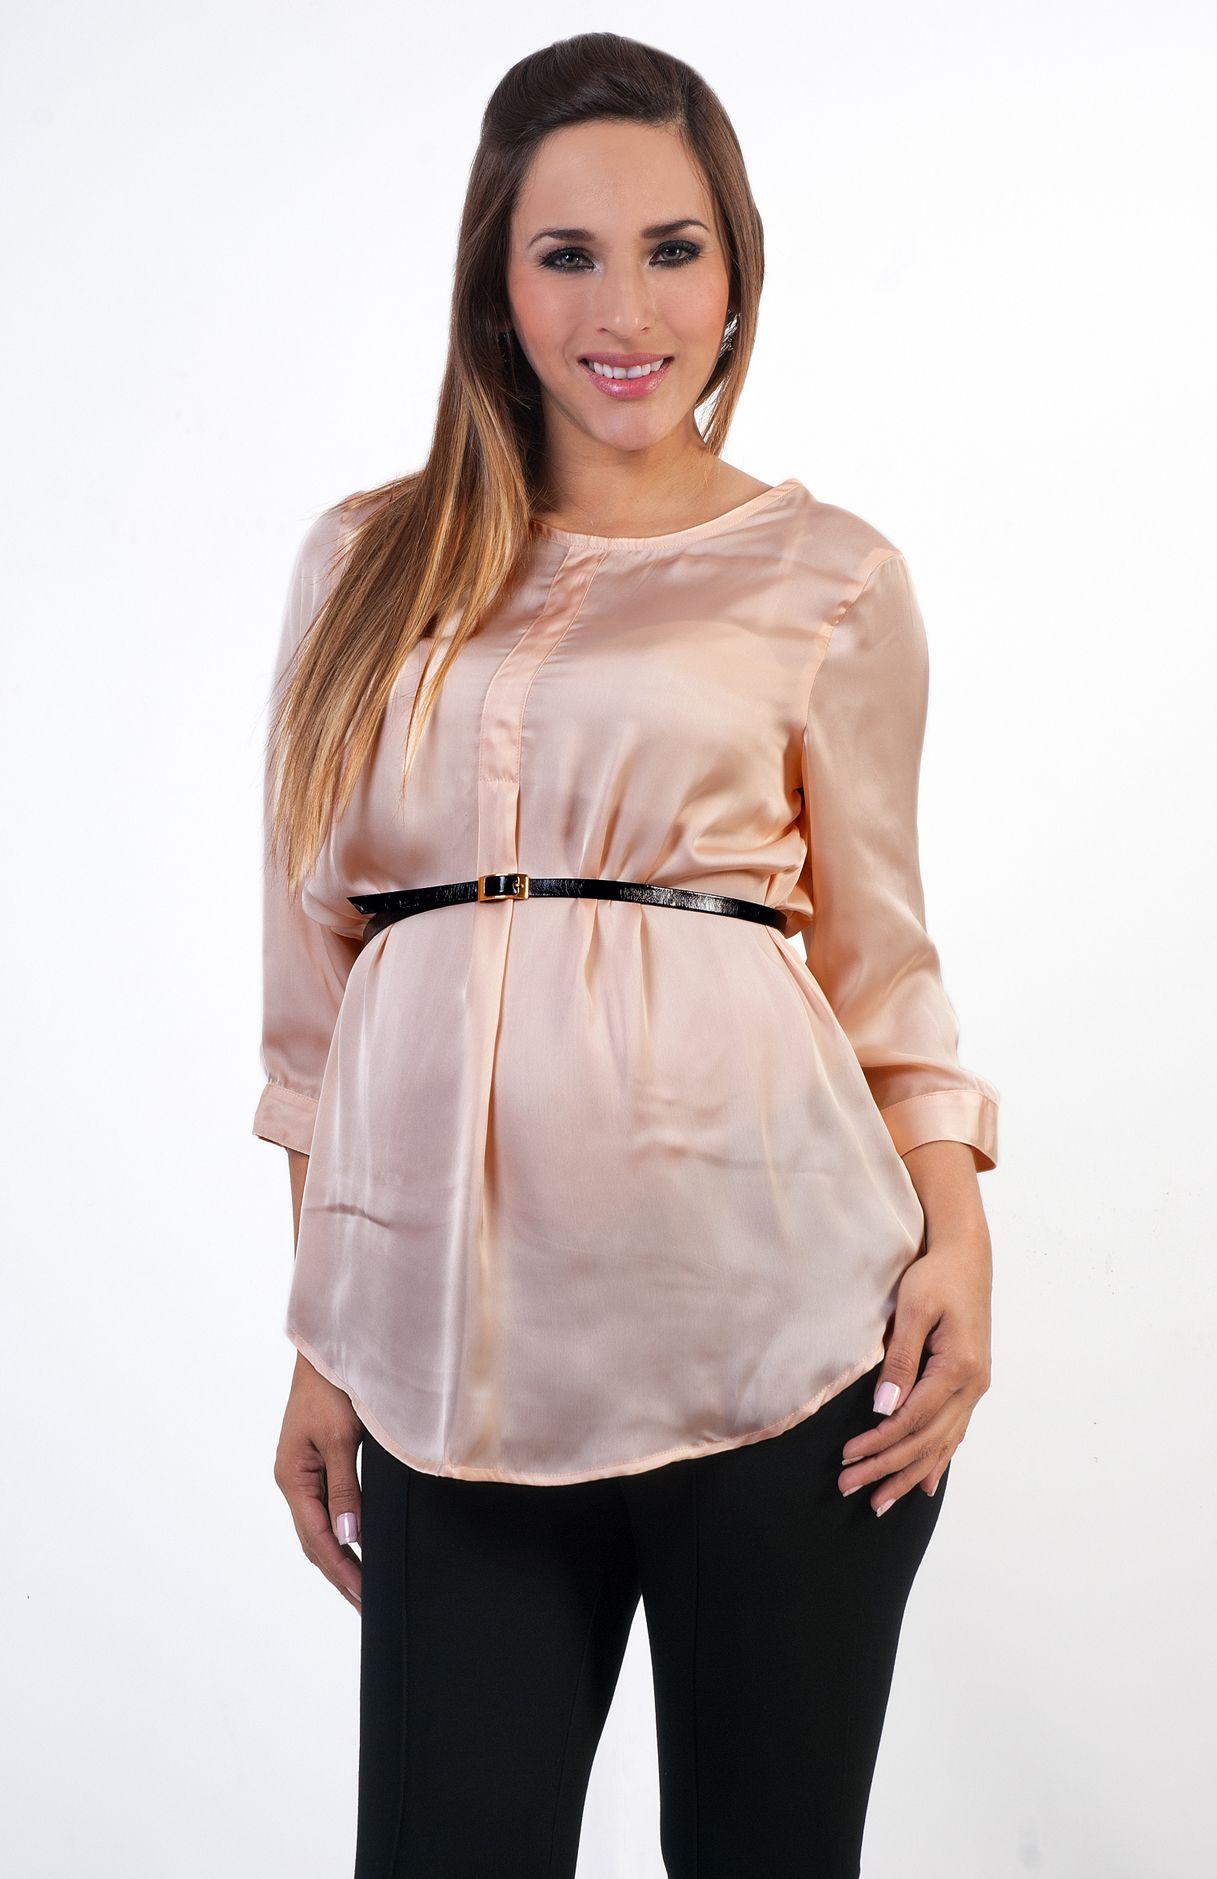 3547eeb73 ropa de maternidad  blusadematernidad  maternityblouse de seda   Athinamaternity